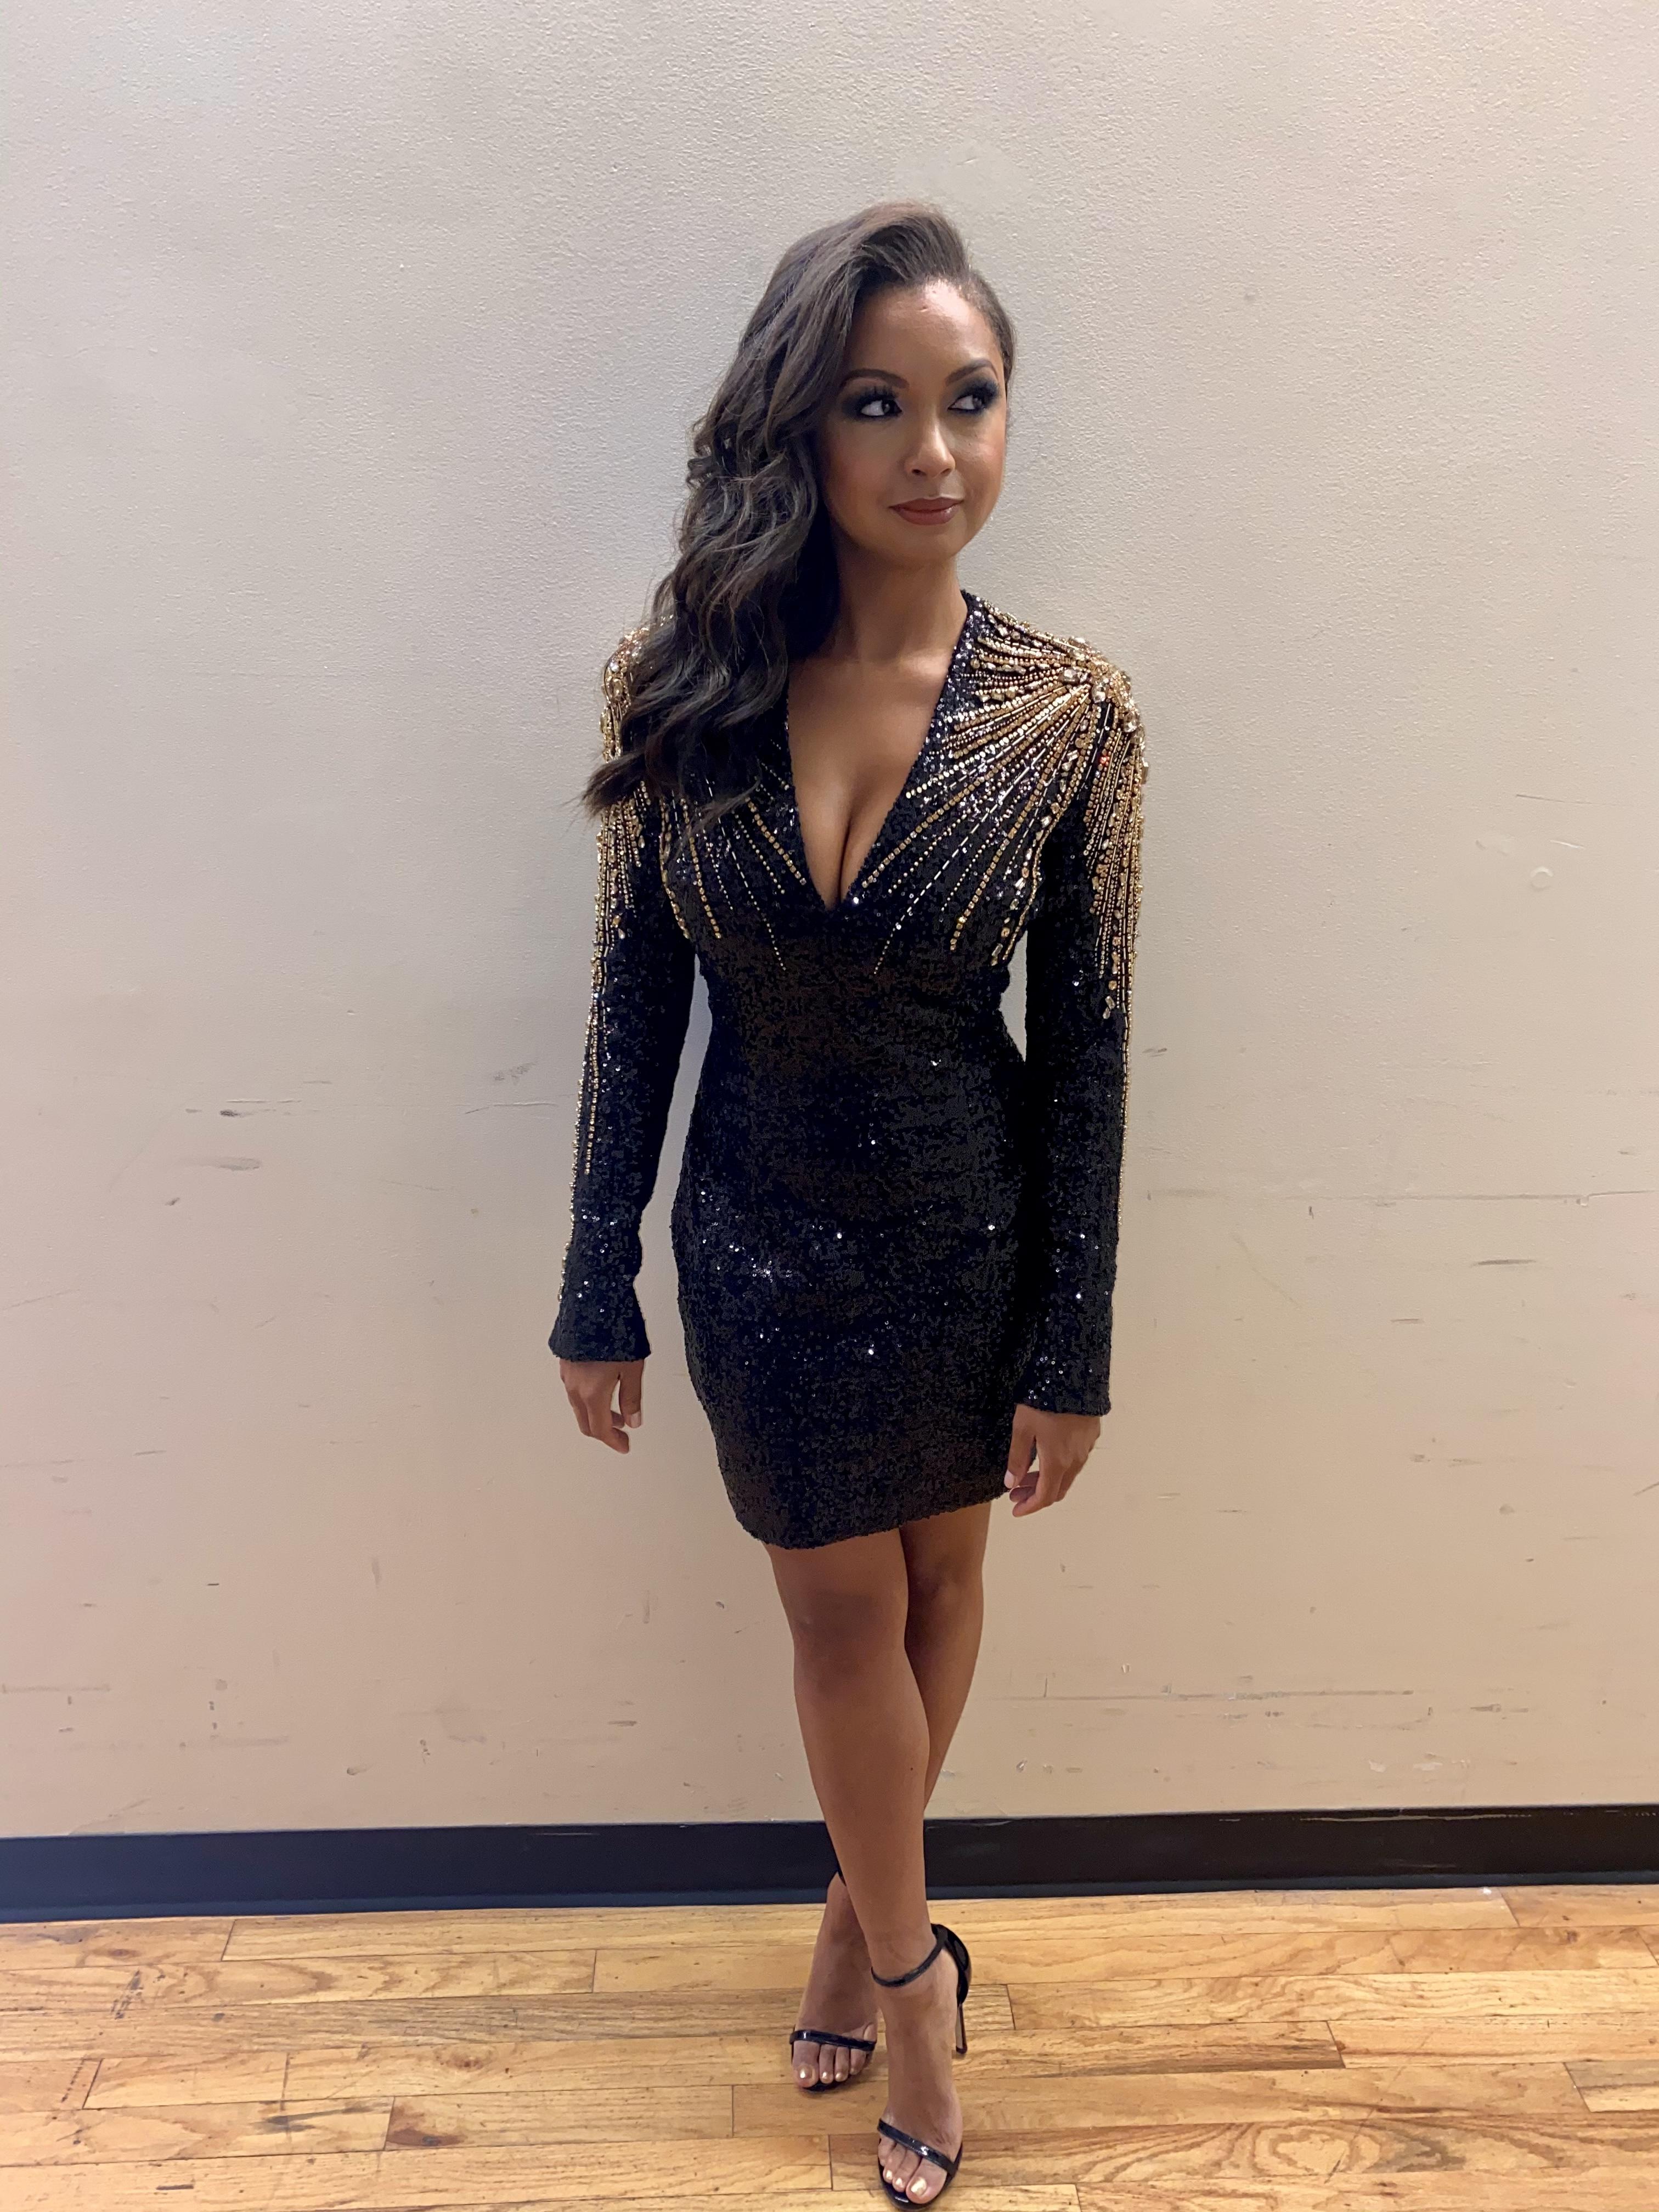 Eboni K Williams